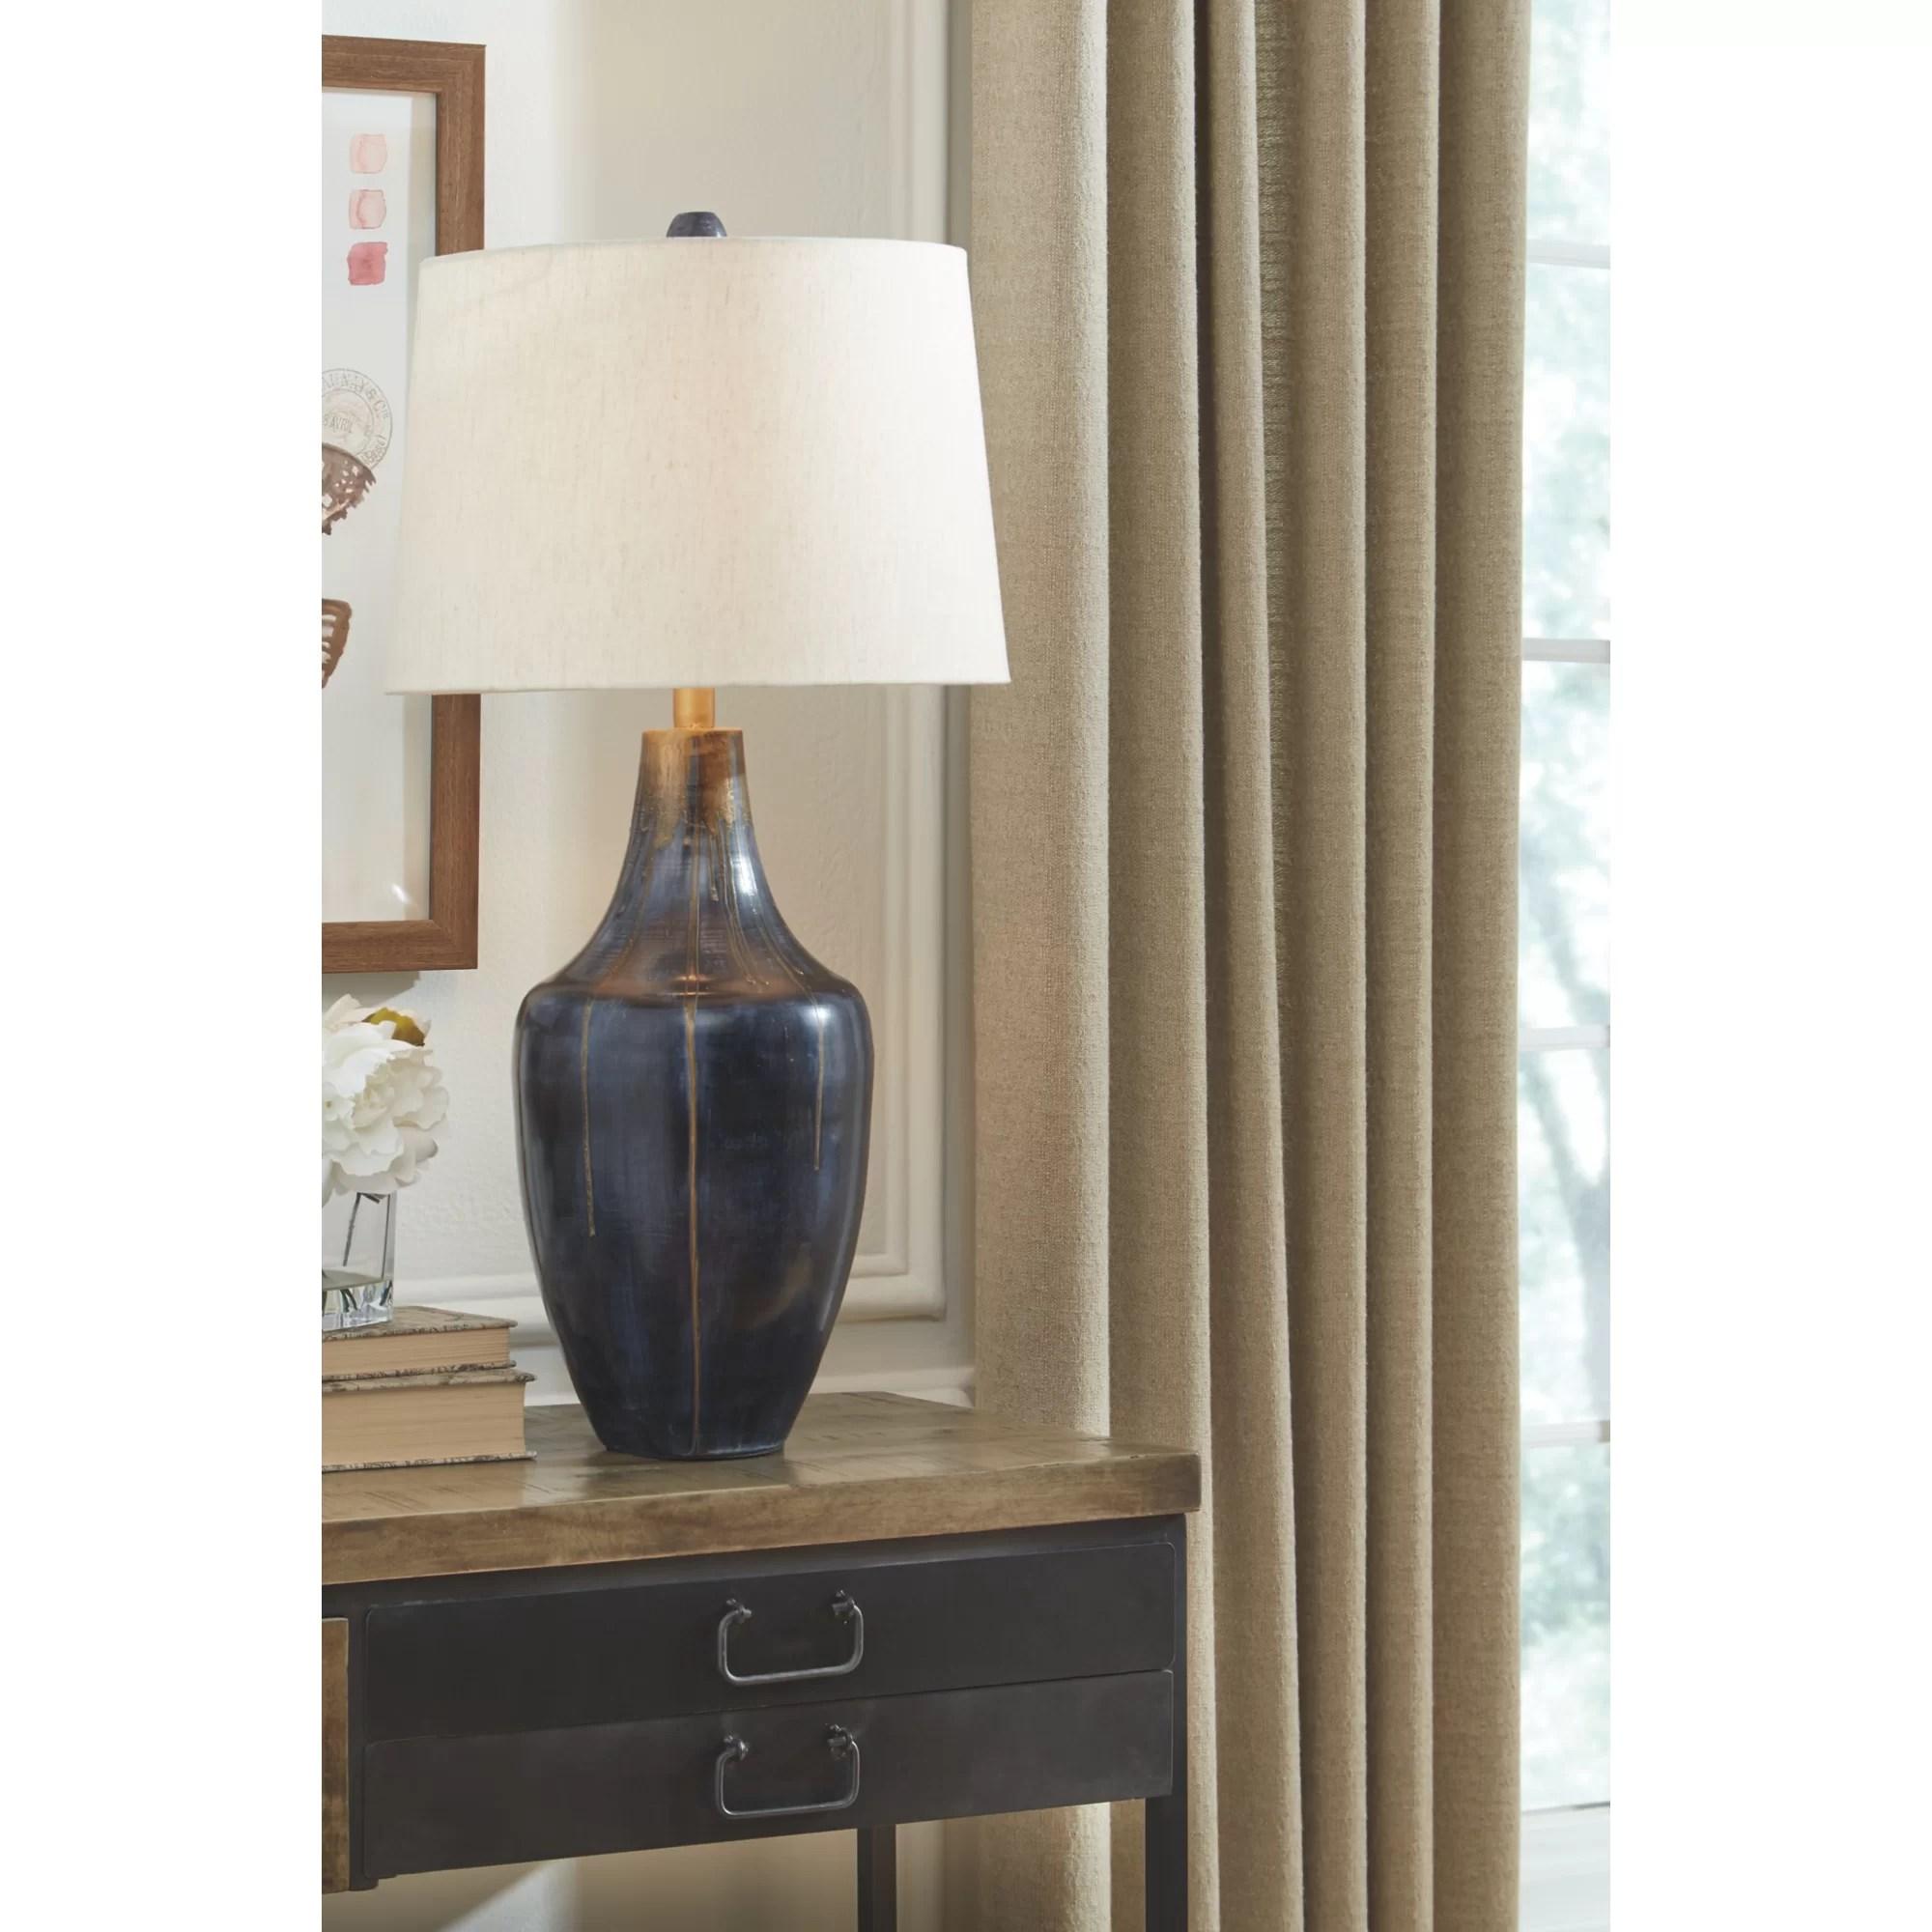 jablonski 31 indigo table lamp